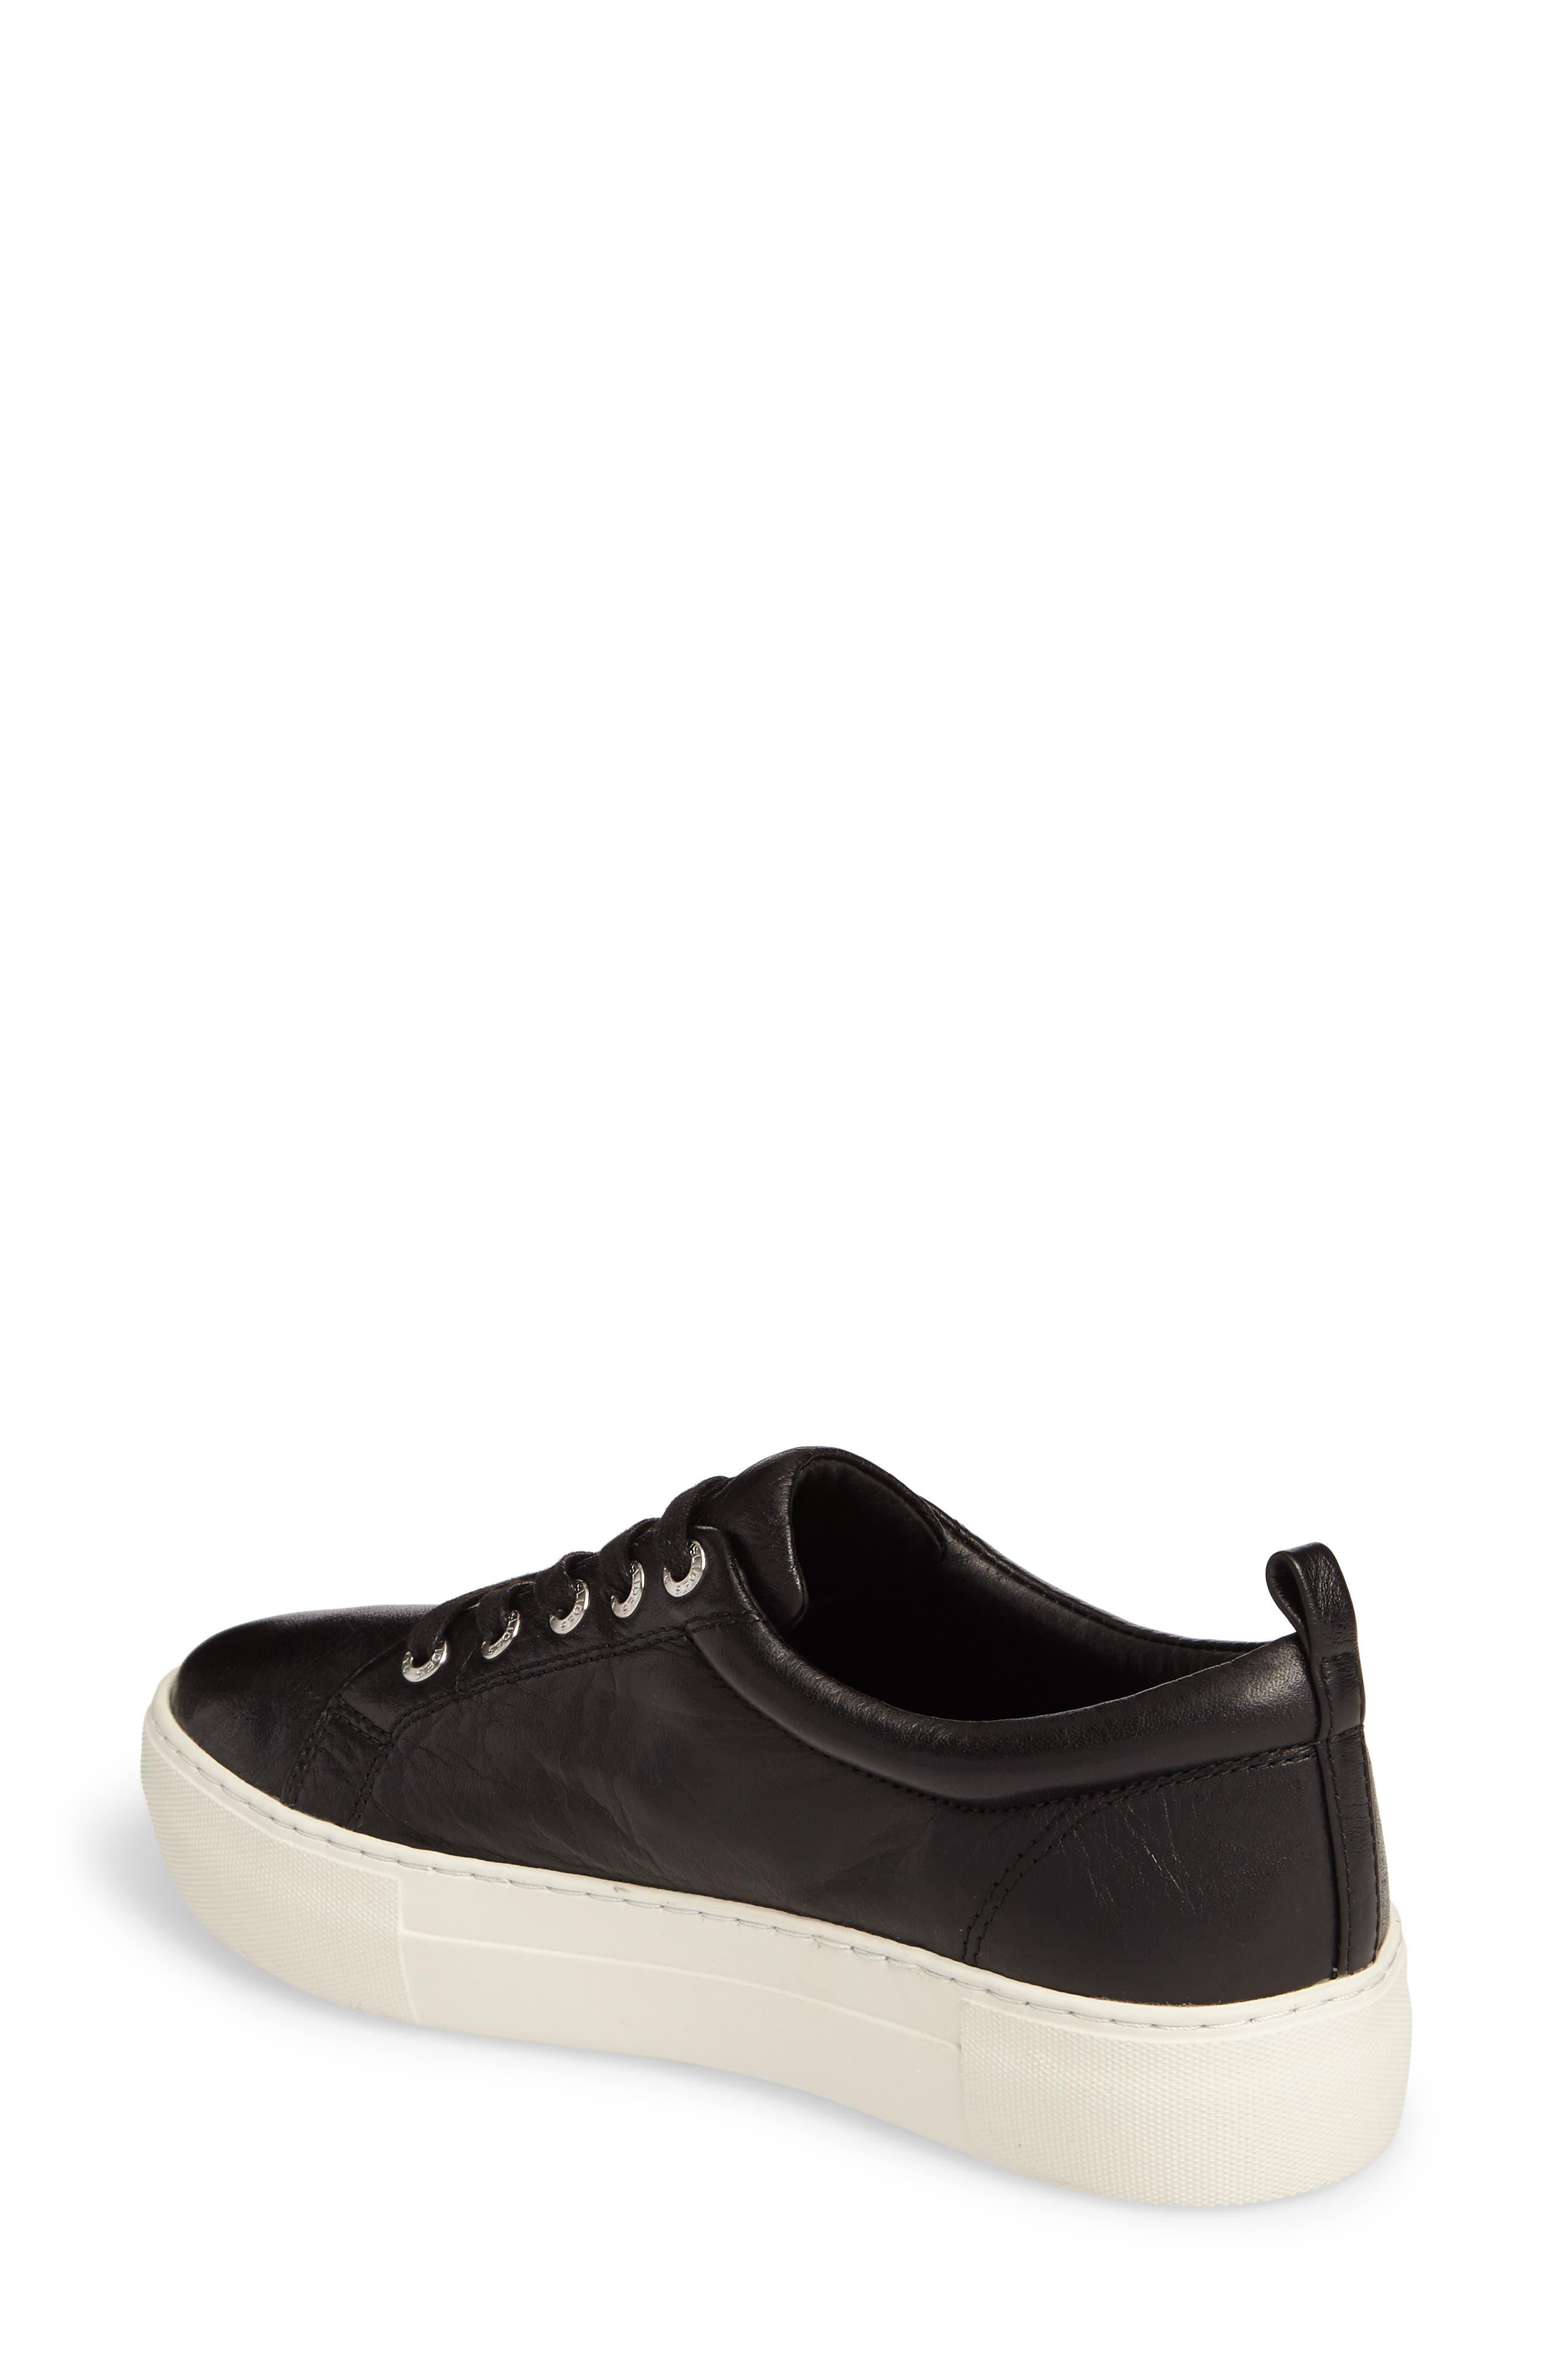 JSLIDES,                             Ambrosia Studded Lace-Up Sneaker,                             Alternate thumbnail 2, color,                             015